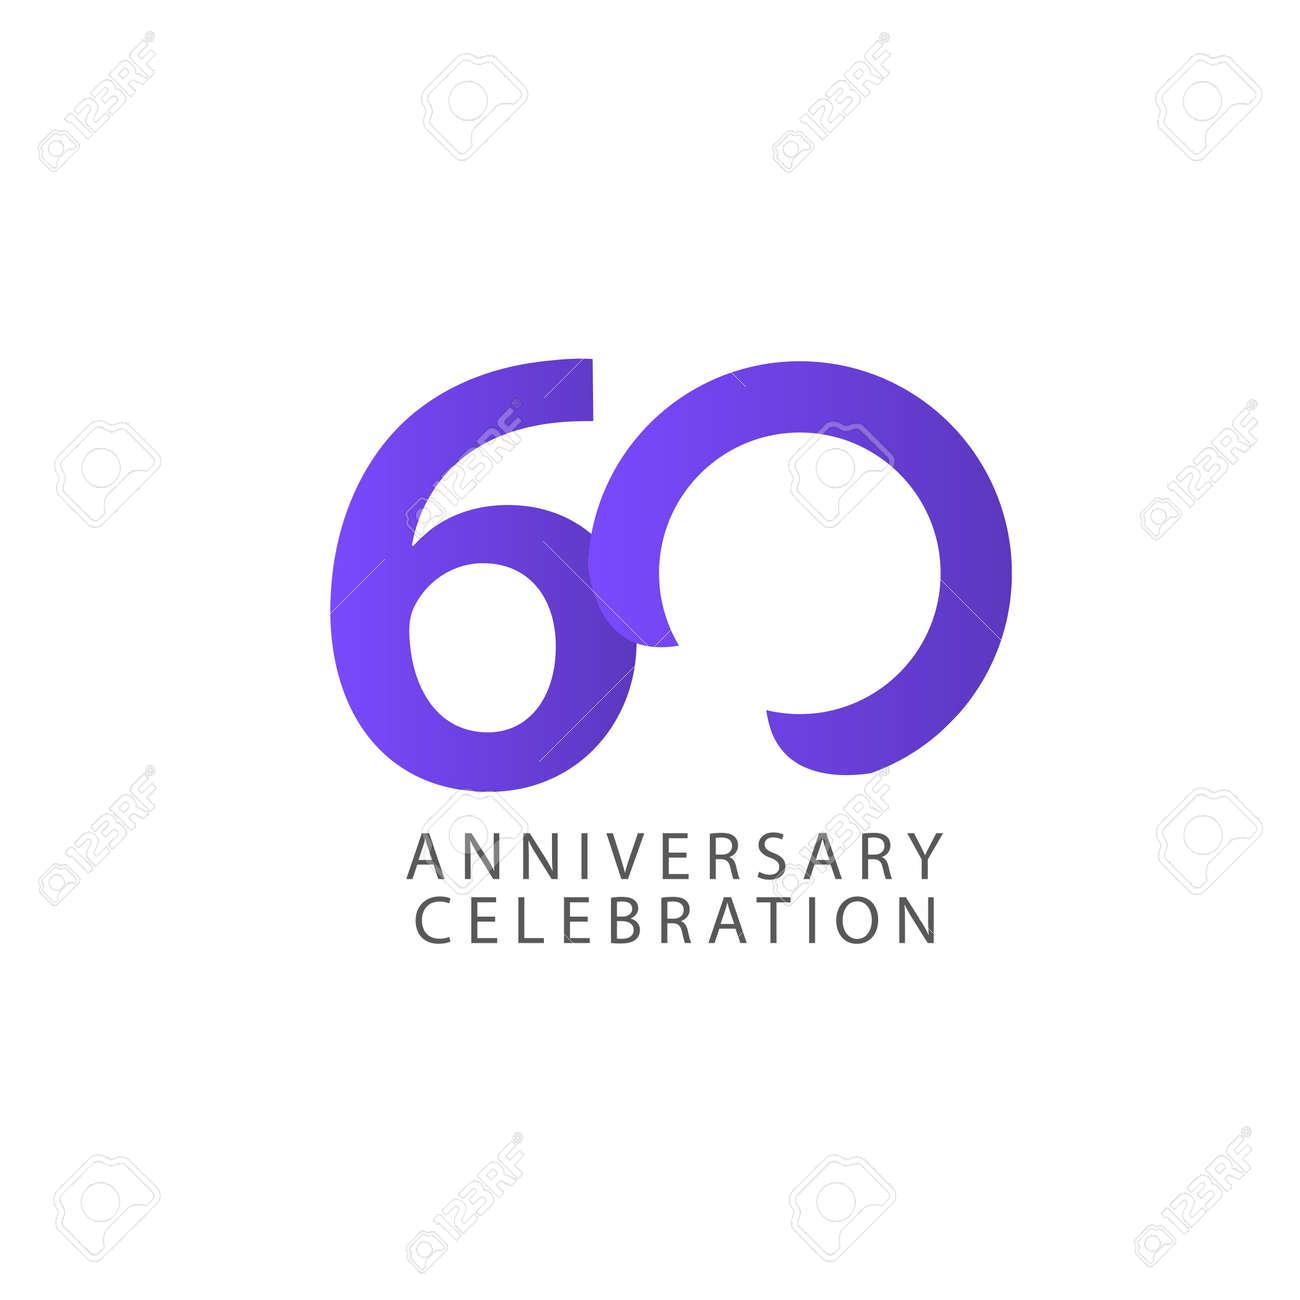 60 Years Anniversary Celebration Vector Template Design Illustration - 163698162